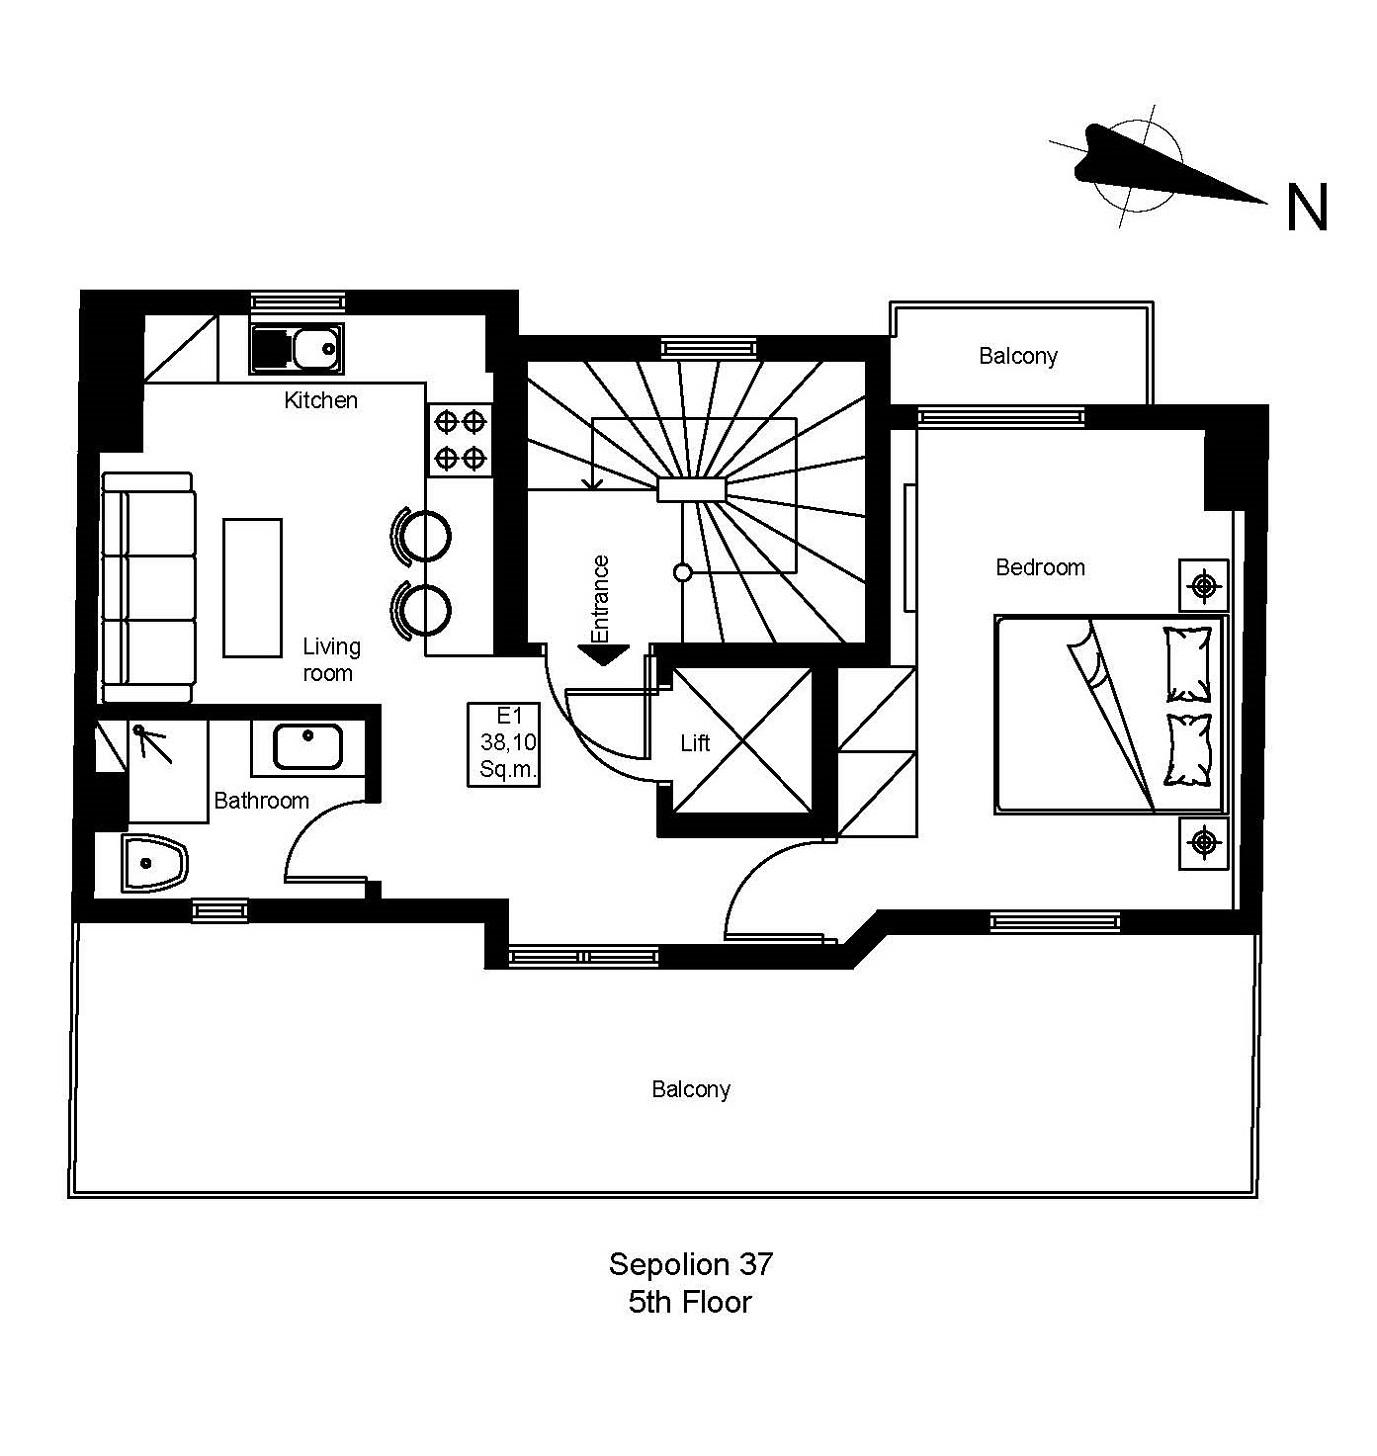 Sepolion 37 5th floor plan